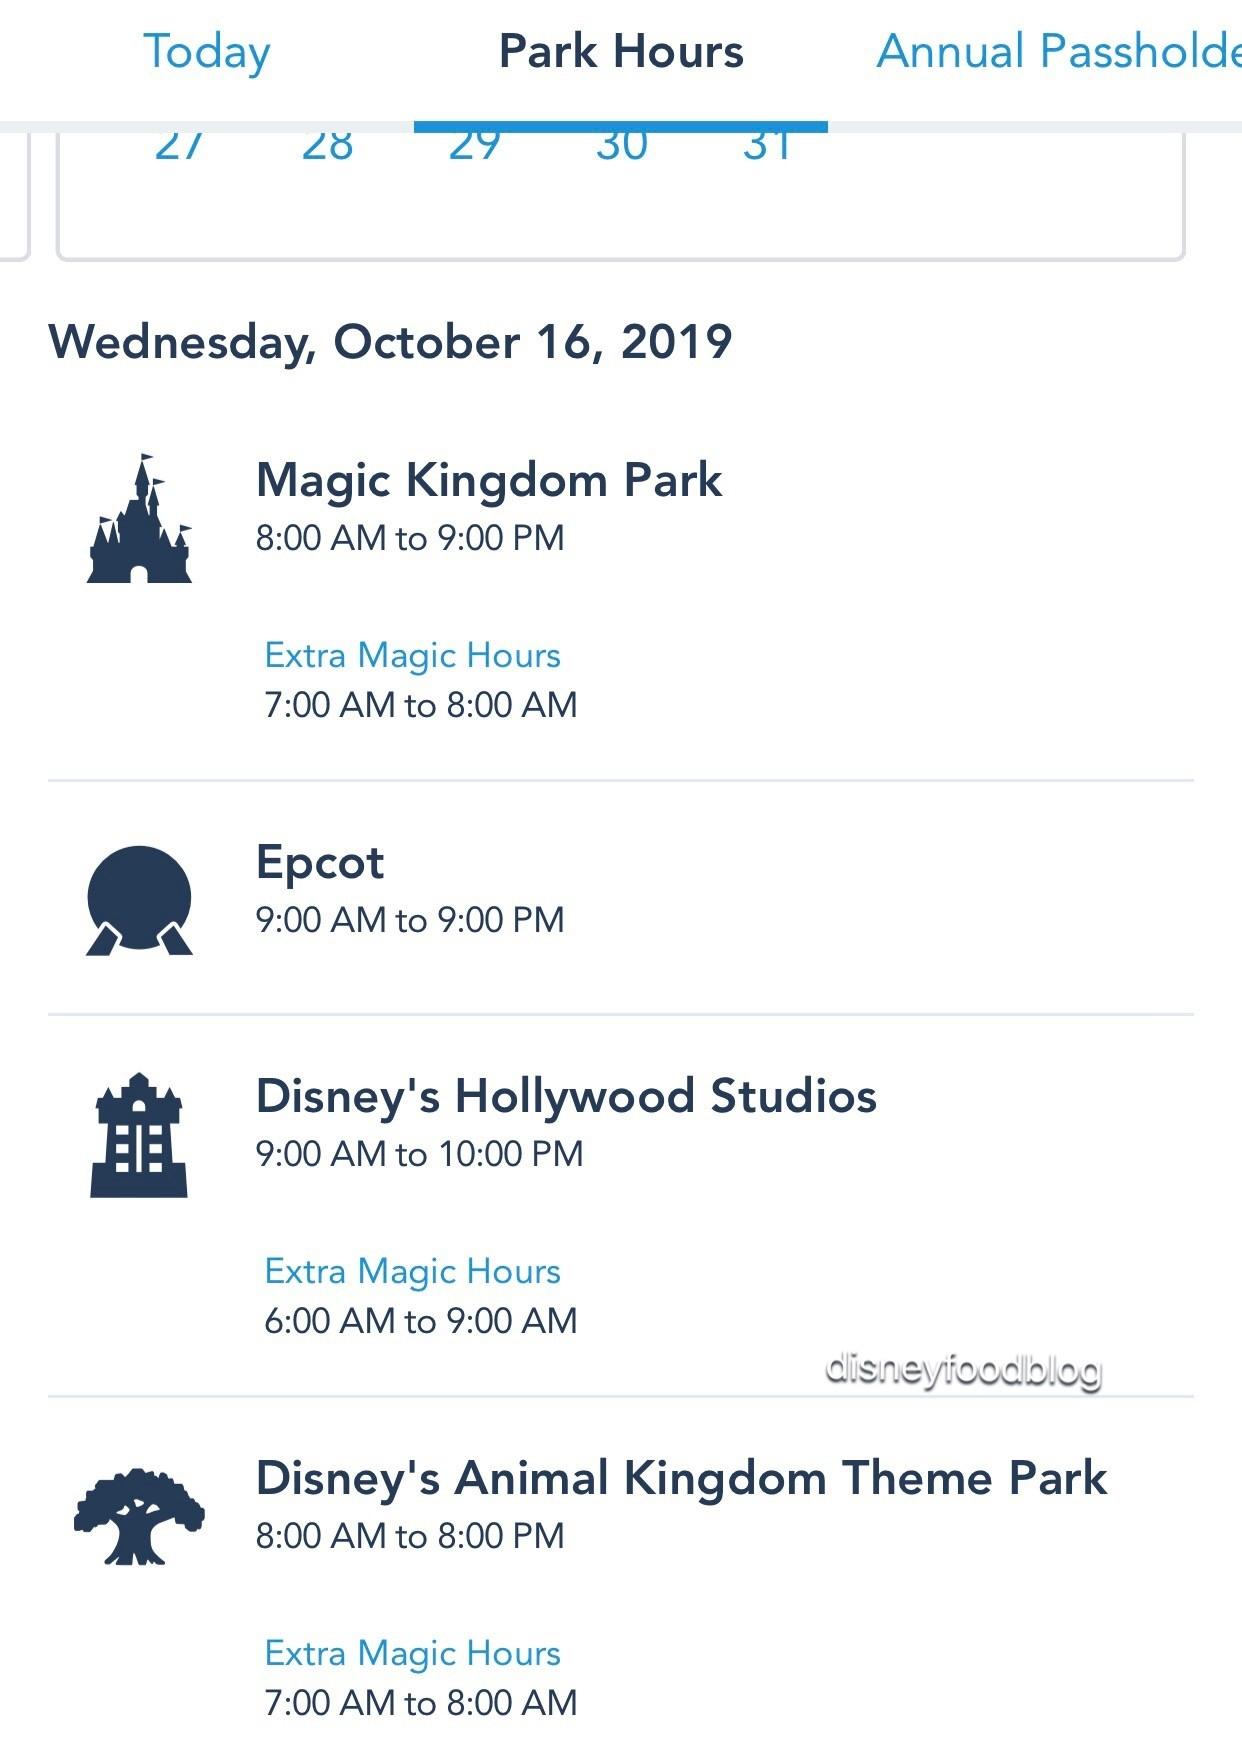 Disney World Adding Extra Extra Magic Hours At Parks This-Extra Magic Hours Calendar January 2020